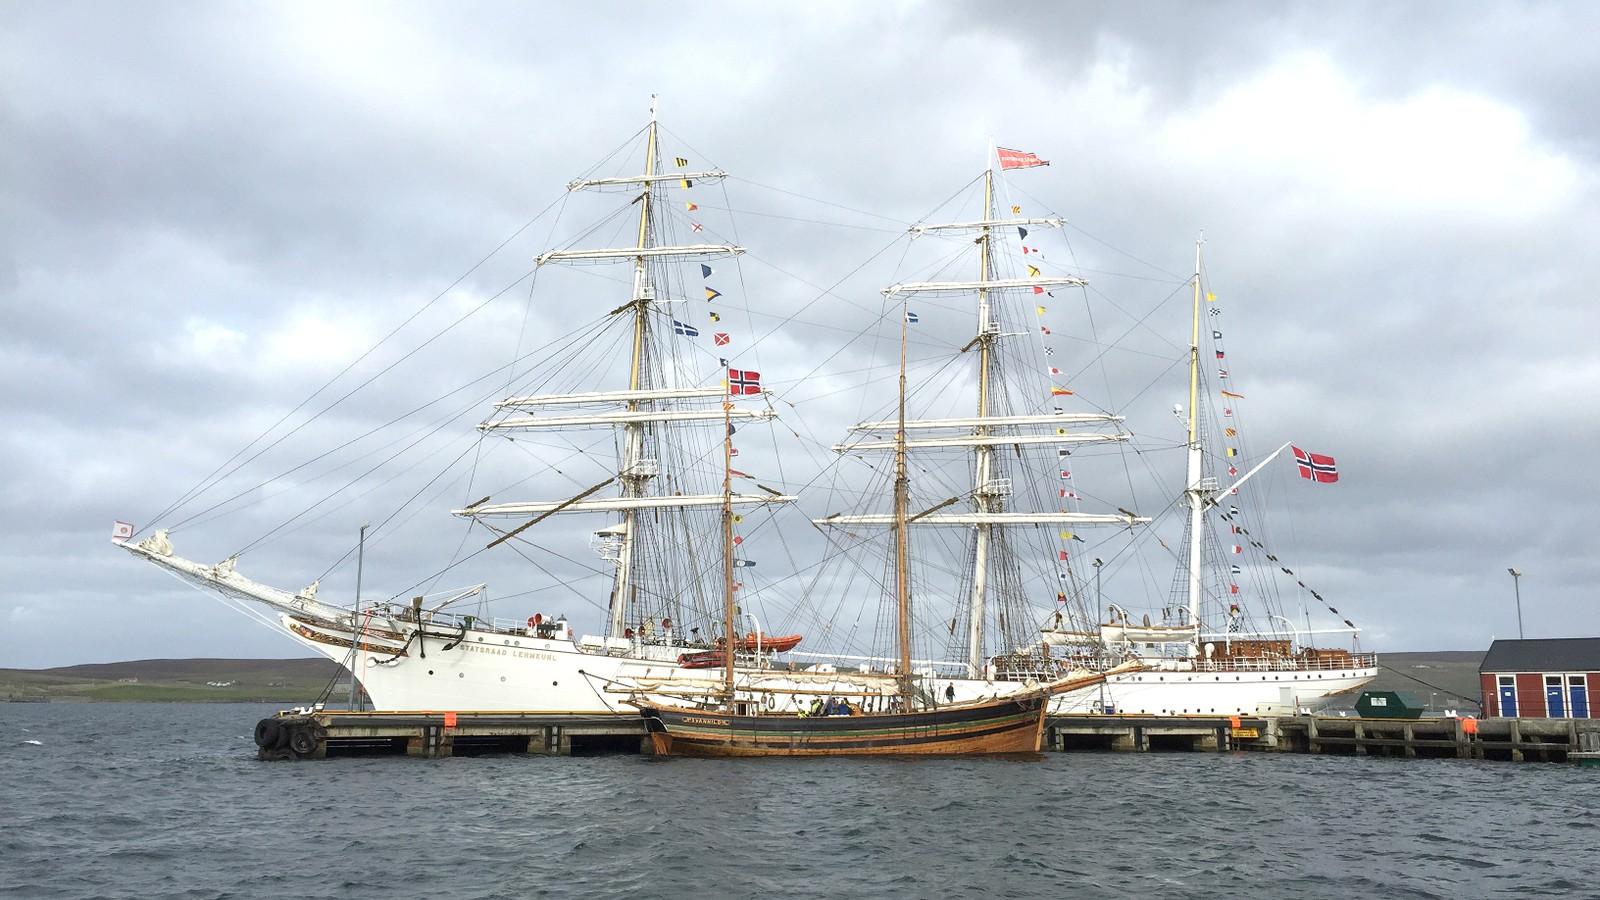 Svanhild og Statsraad Lehmkul ved havn i Lerwick.